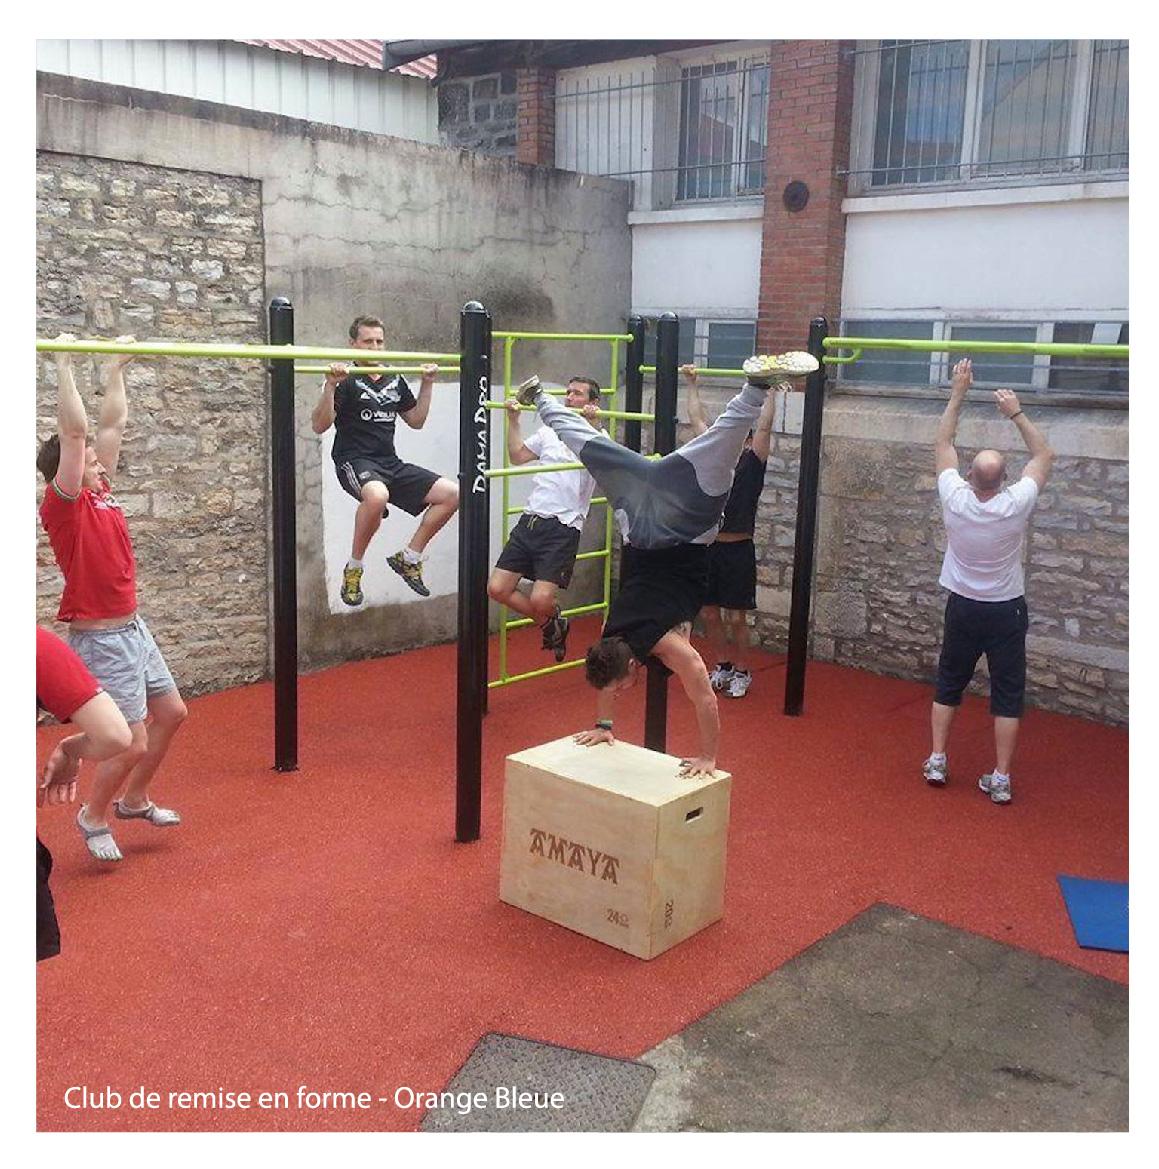 freetness, fitness plein air !